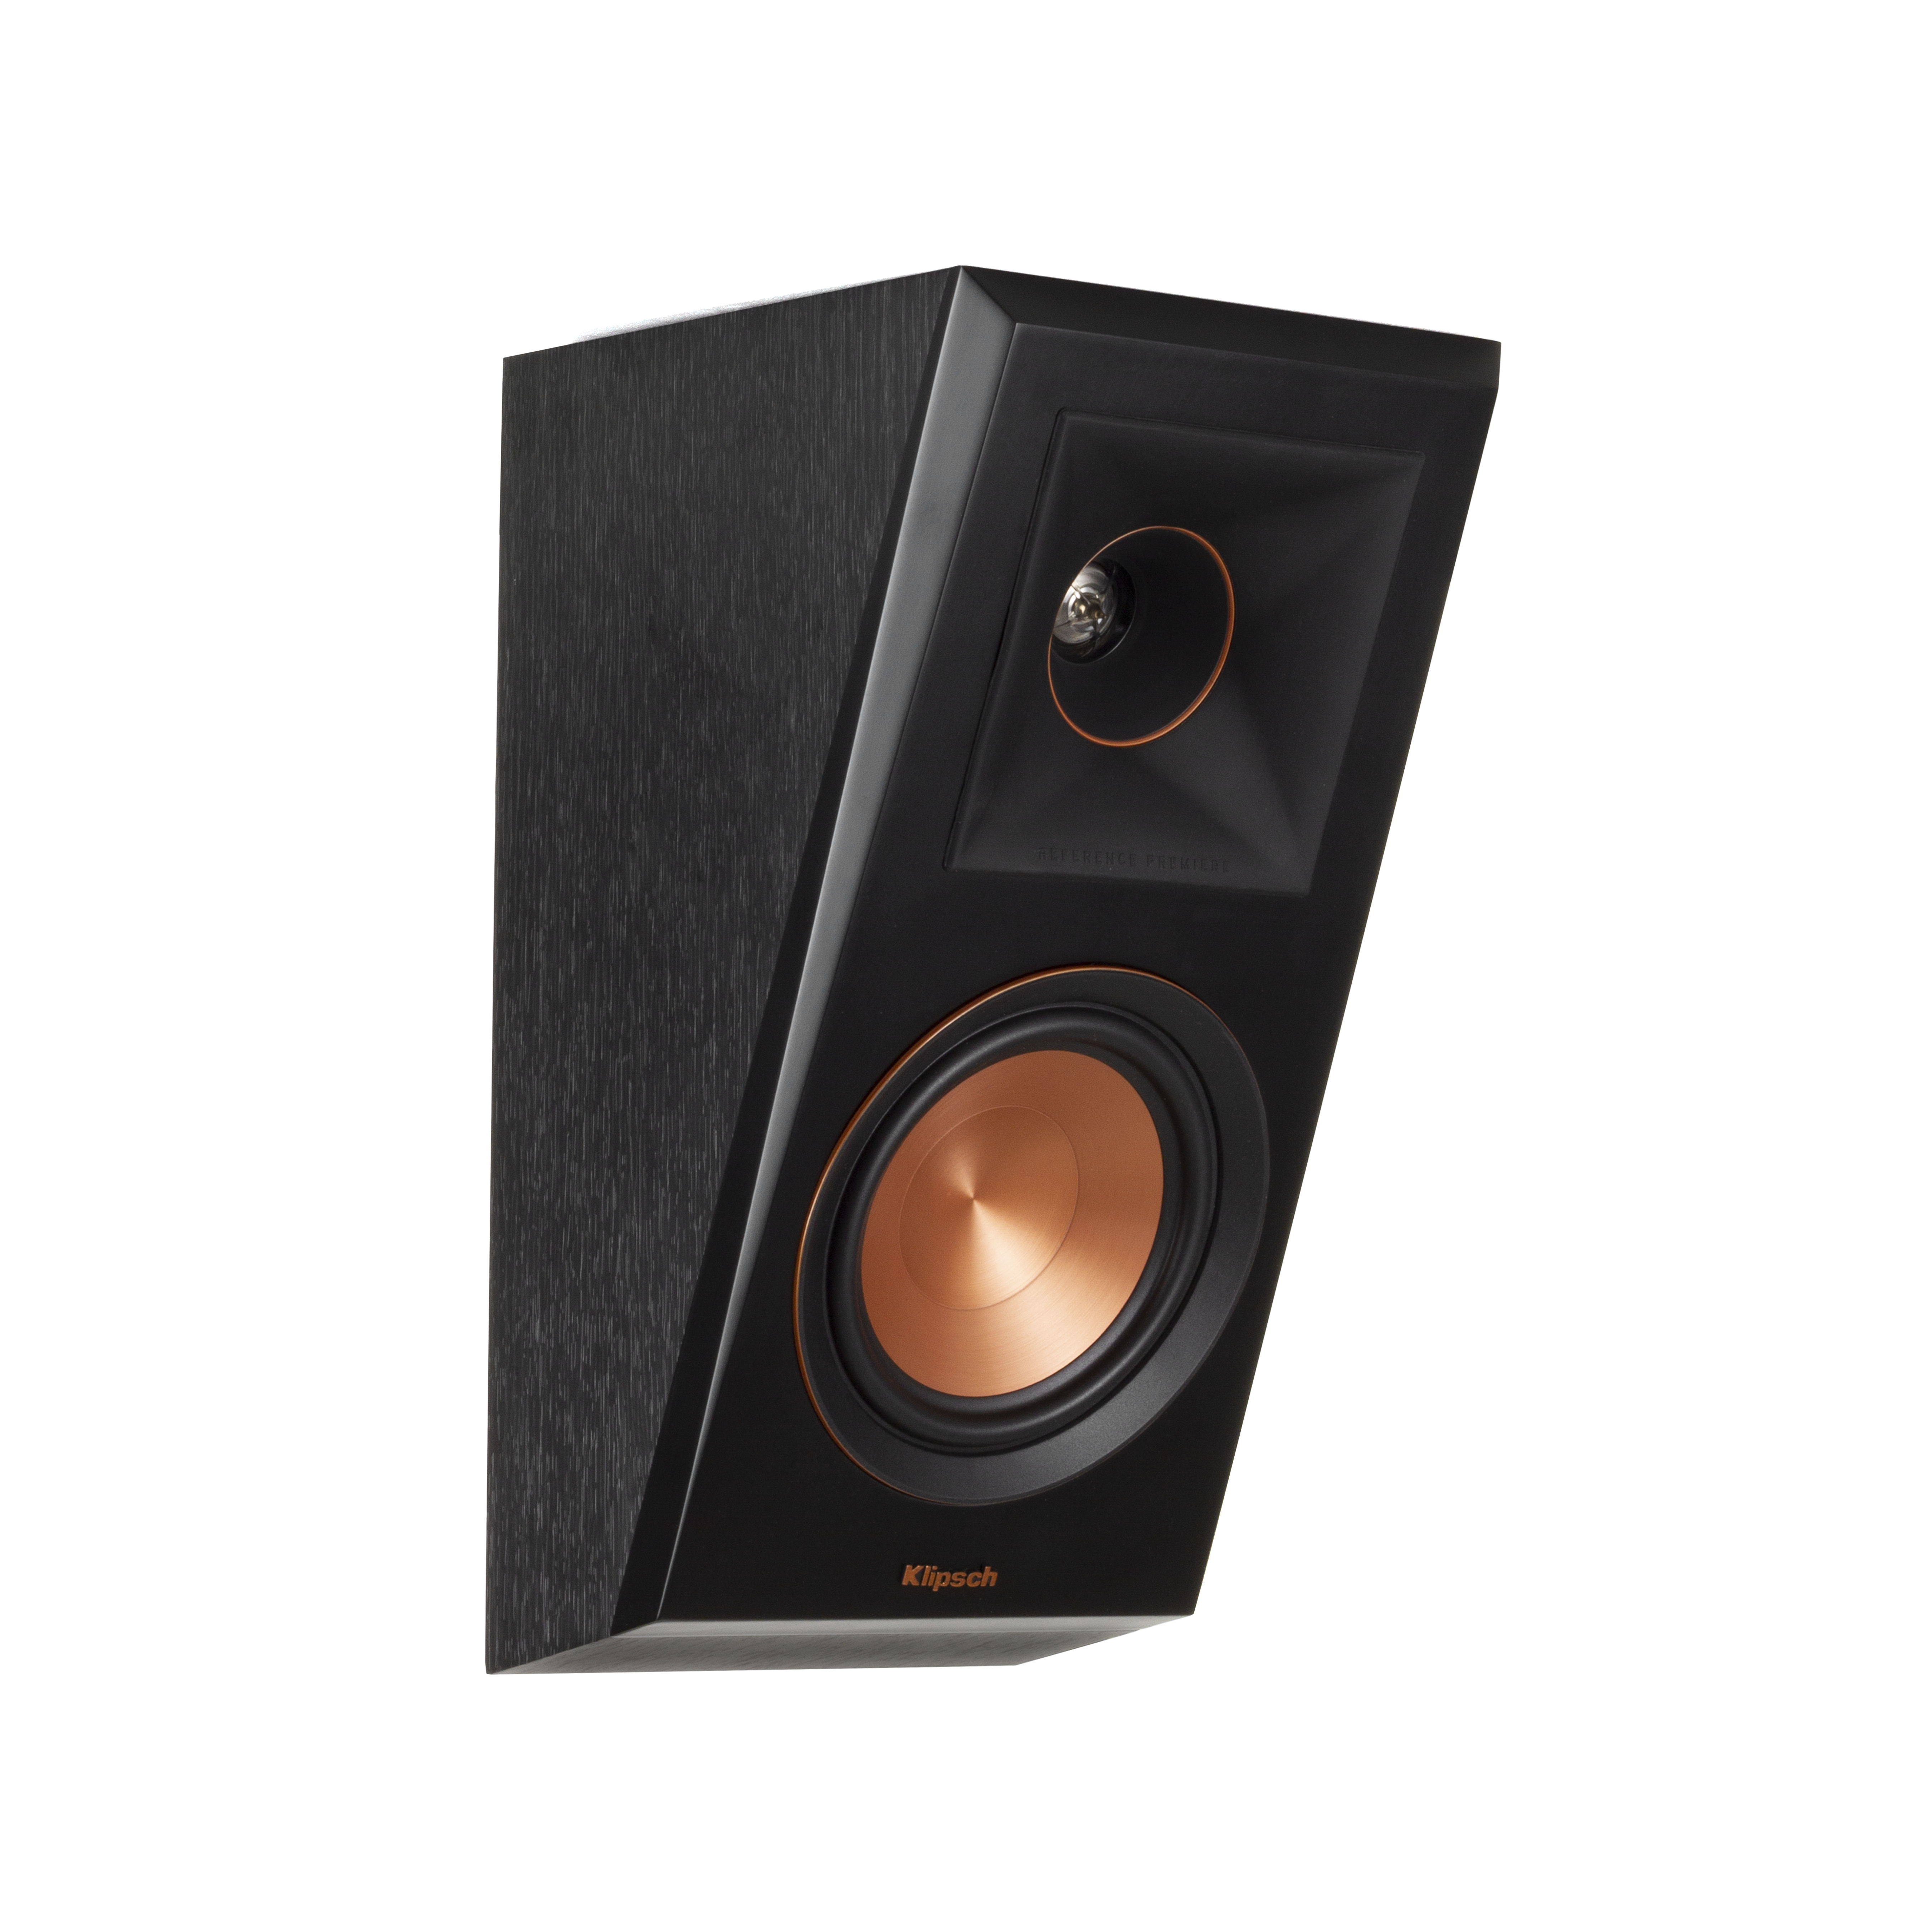 Klipsch RP500SAB Dolby Atmos Surround Speaker - Black(pair)